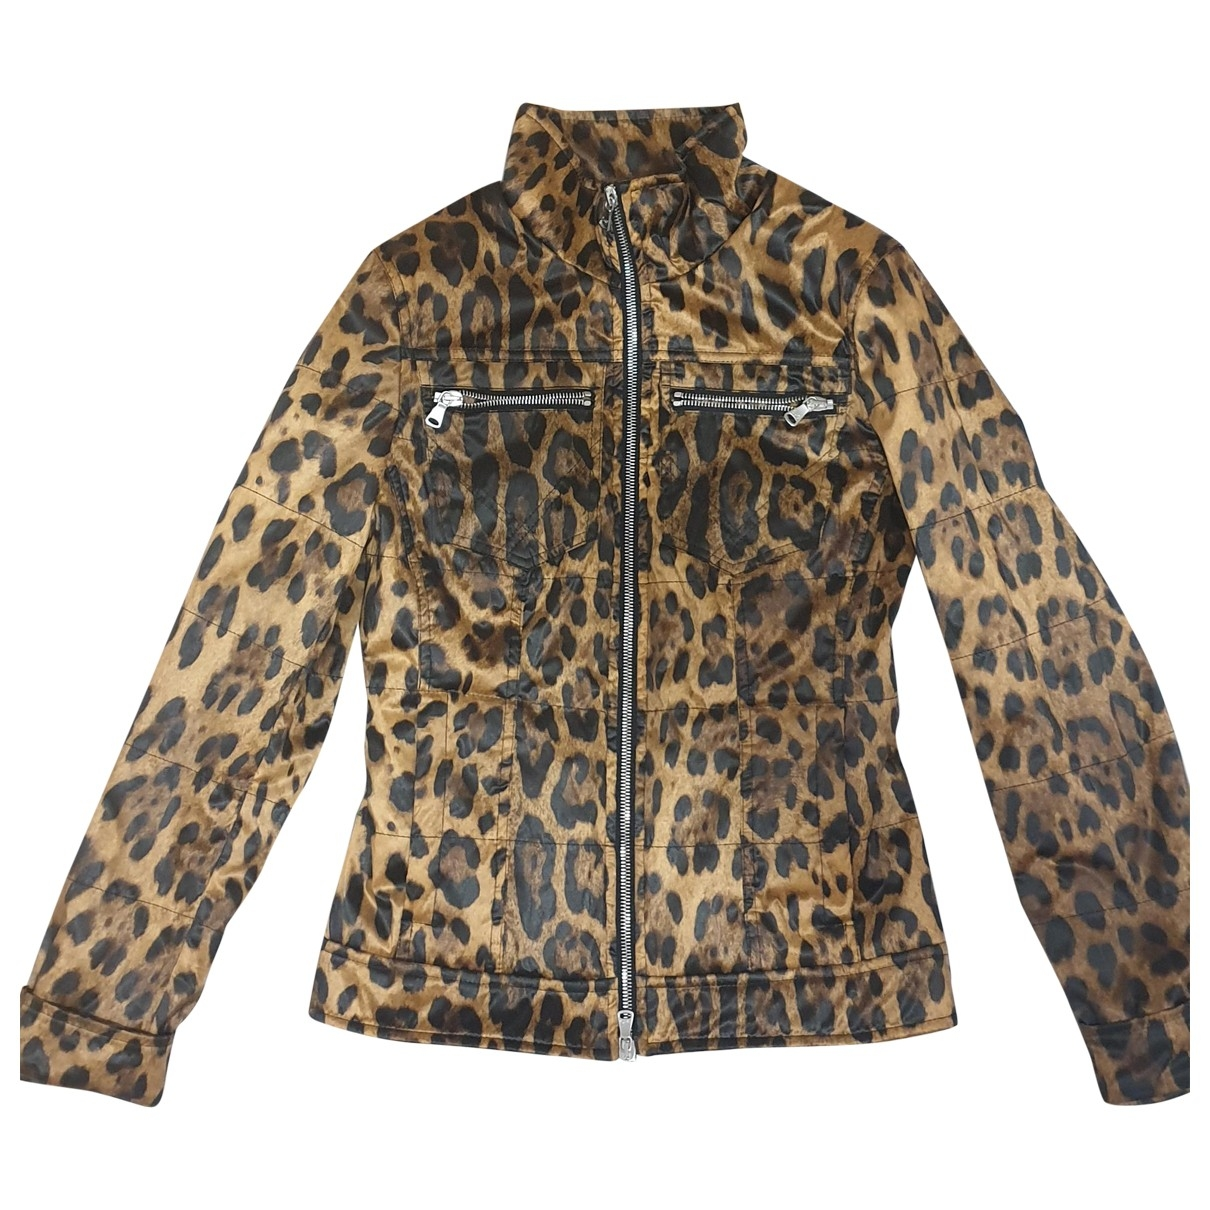 Dolce & Gabbana \N Lederjacke in  Kamel Synthetik